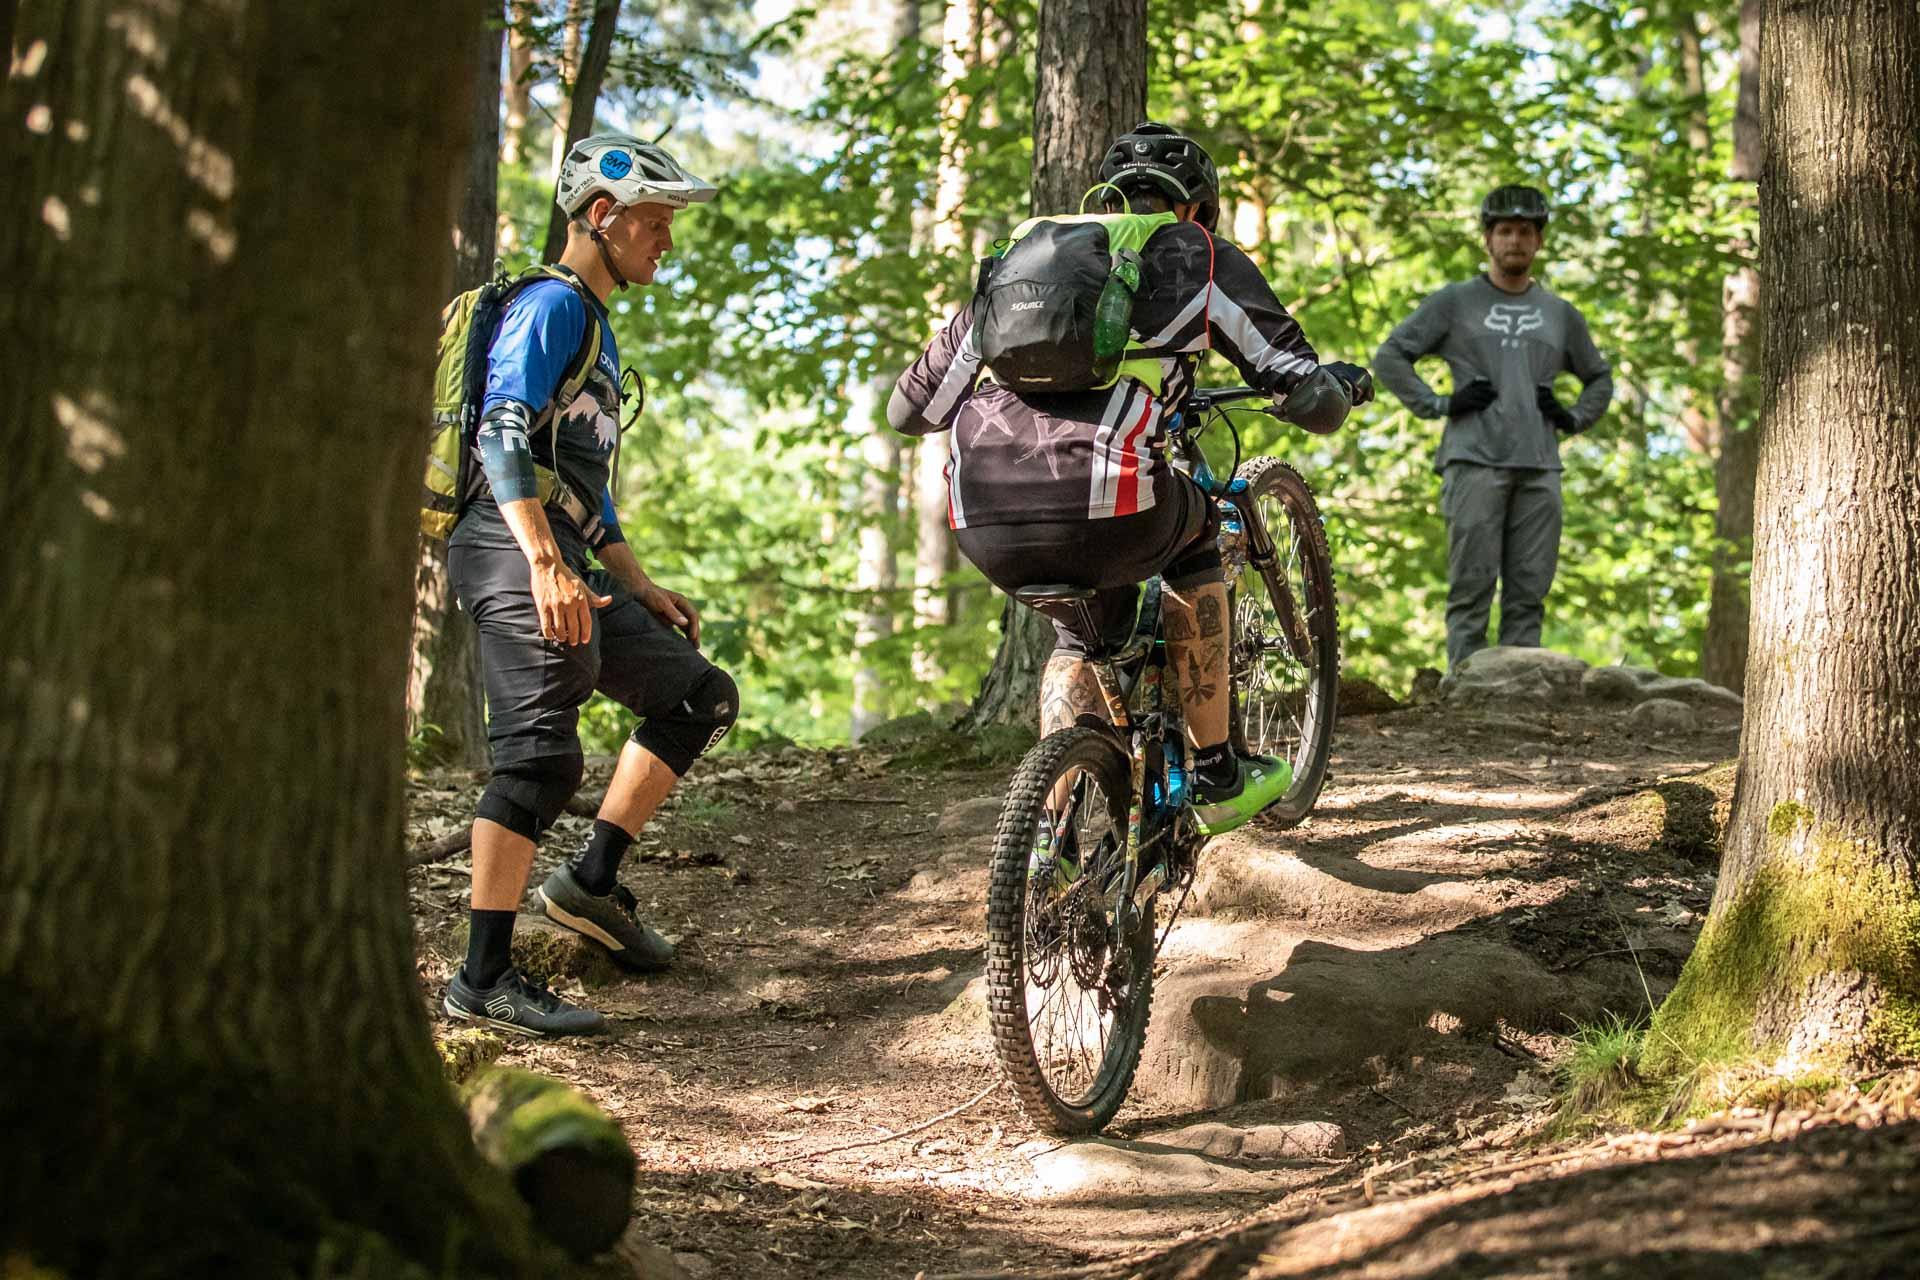 eMTB eBike Fortgeschritten Fahrtechnik Kurs in Siegen - Rock my Trail Bikeschule325